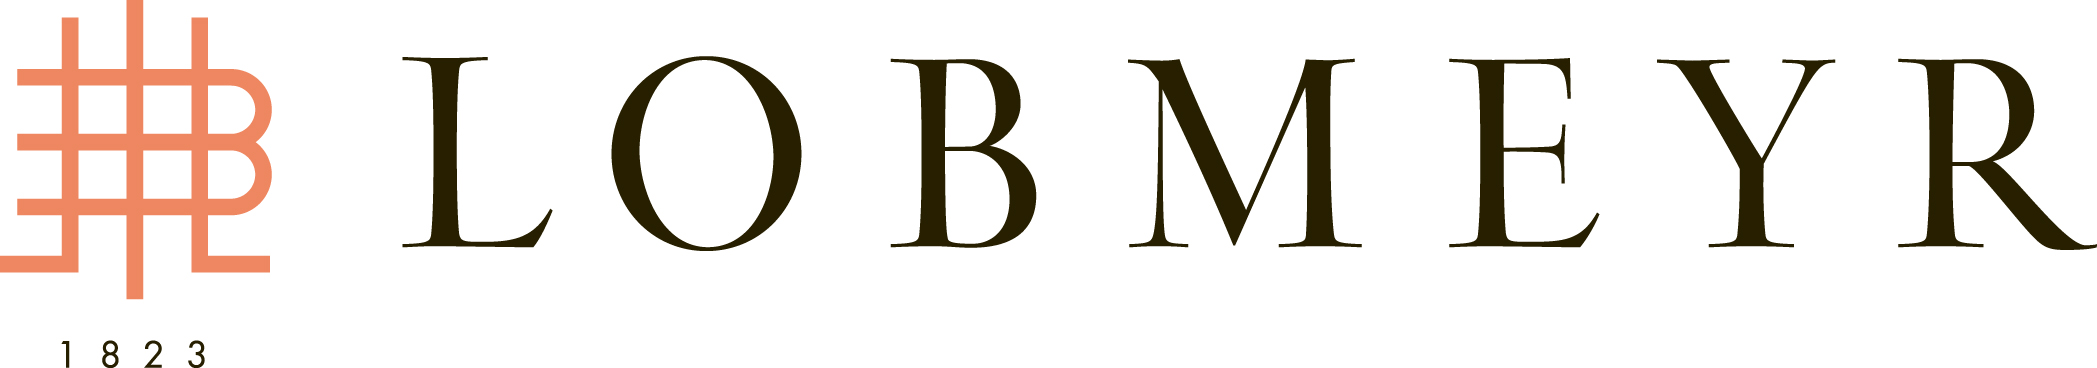 Lobmeyr Logo with text.jpg